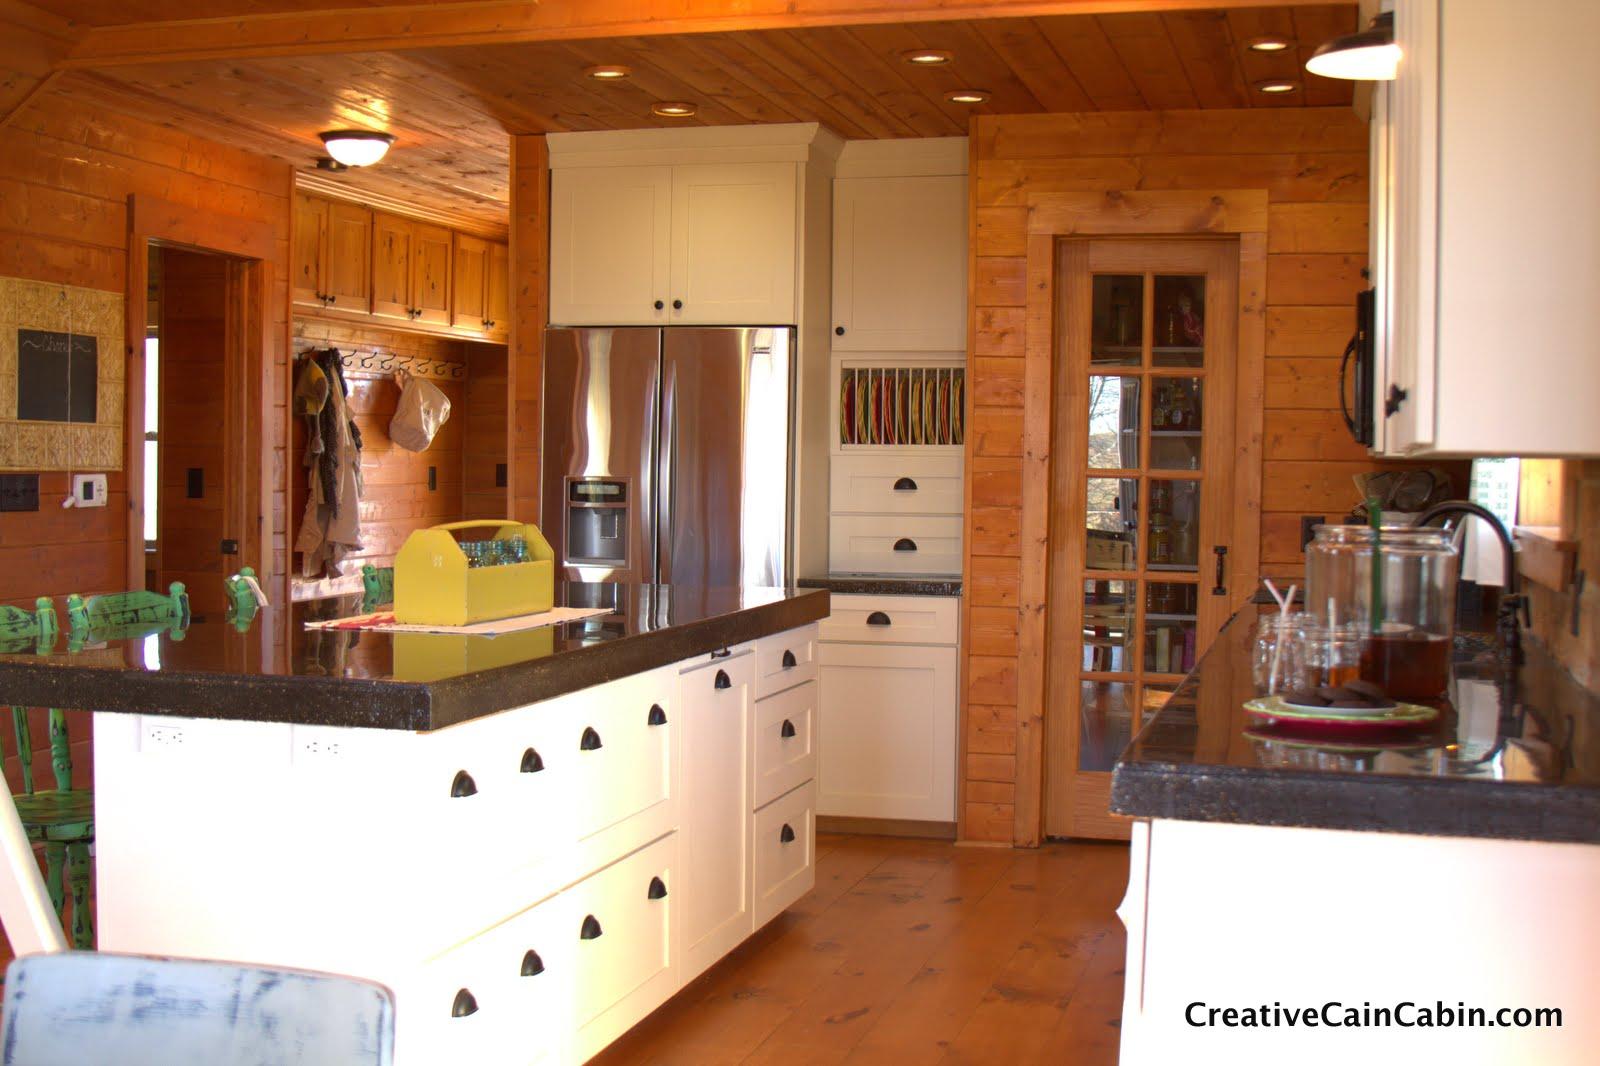 White Kitchen In A Log Home Creative Cain Cabin